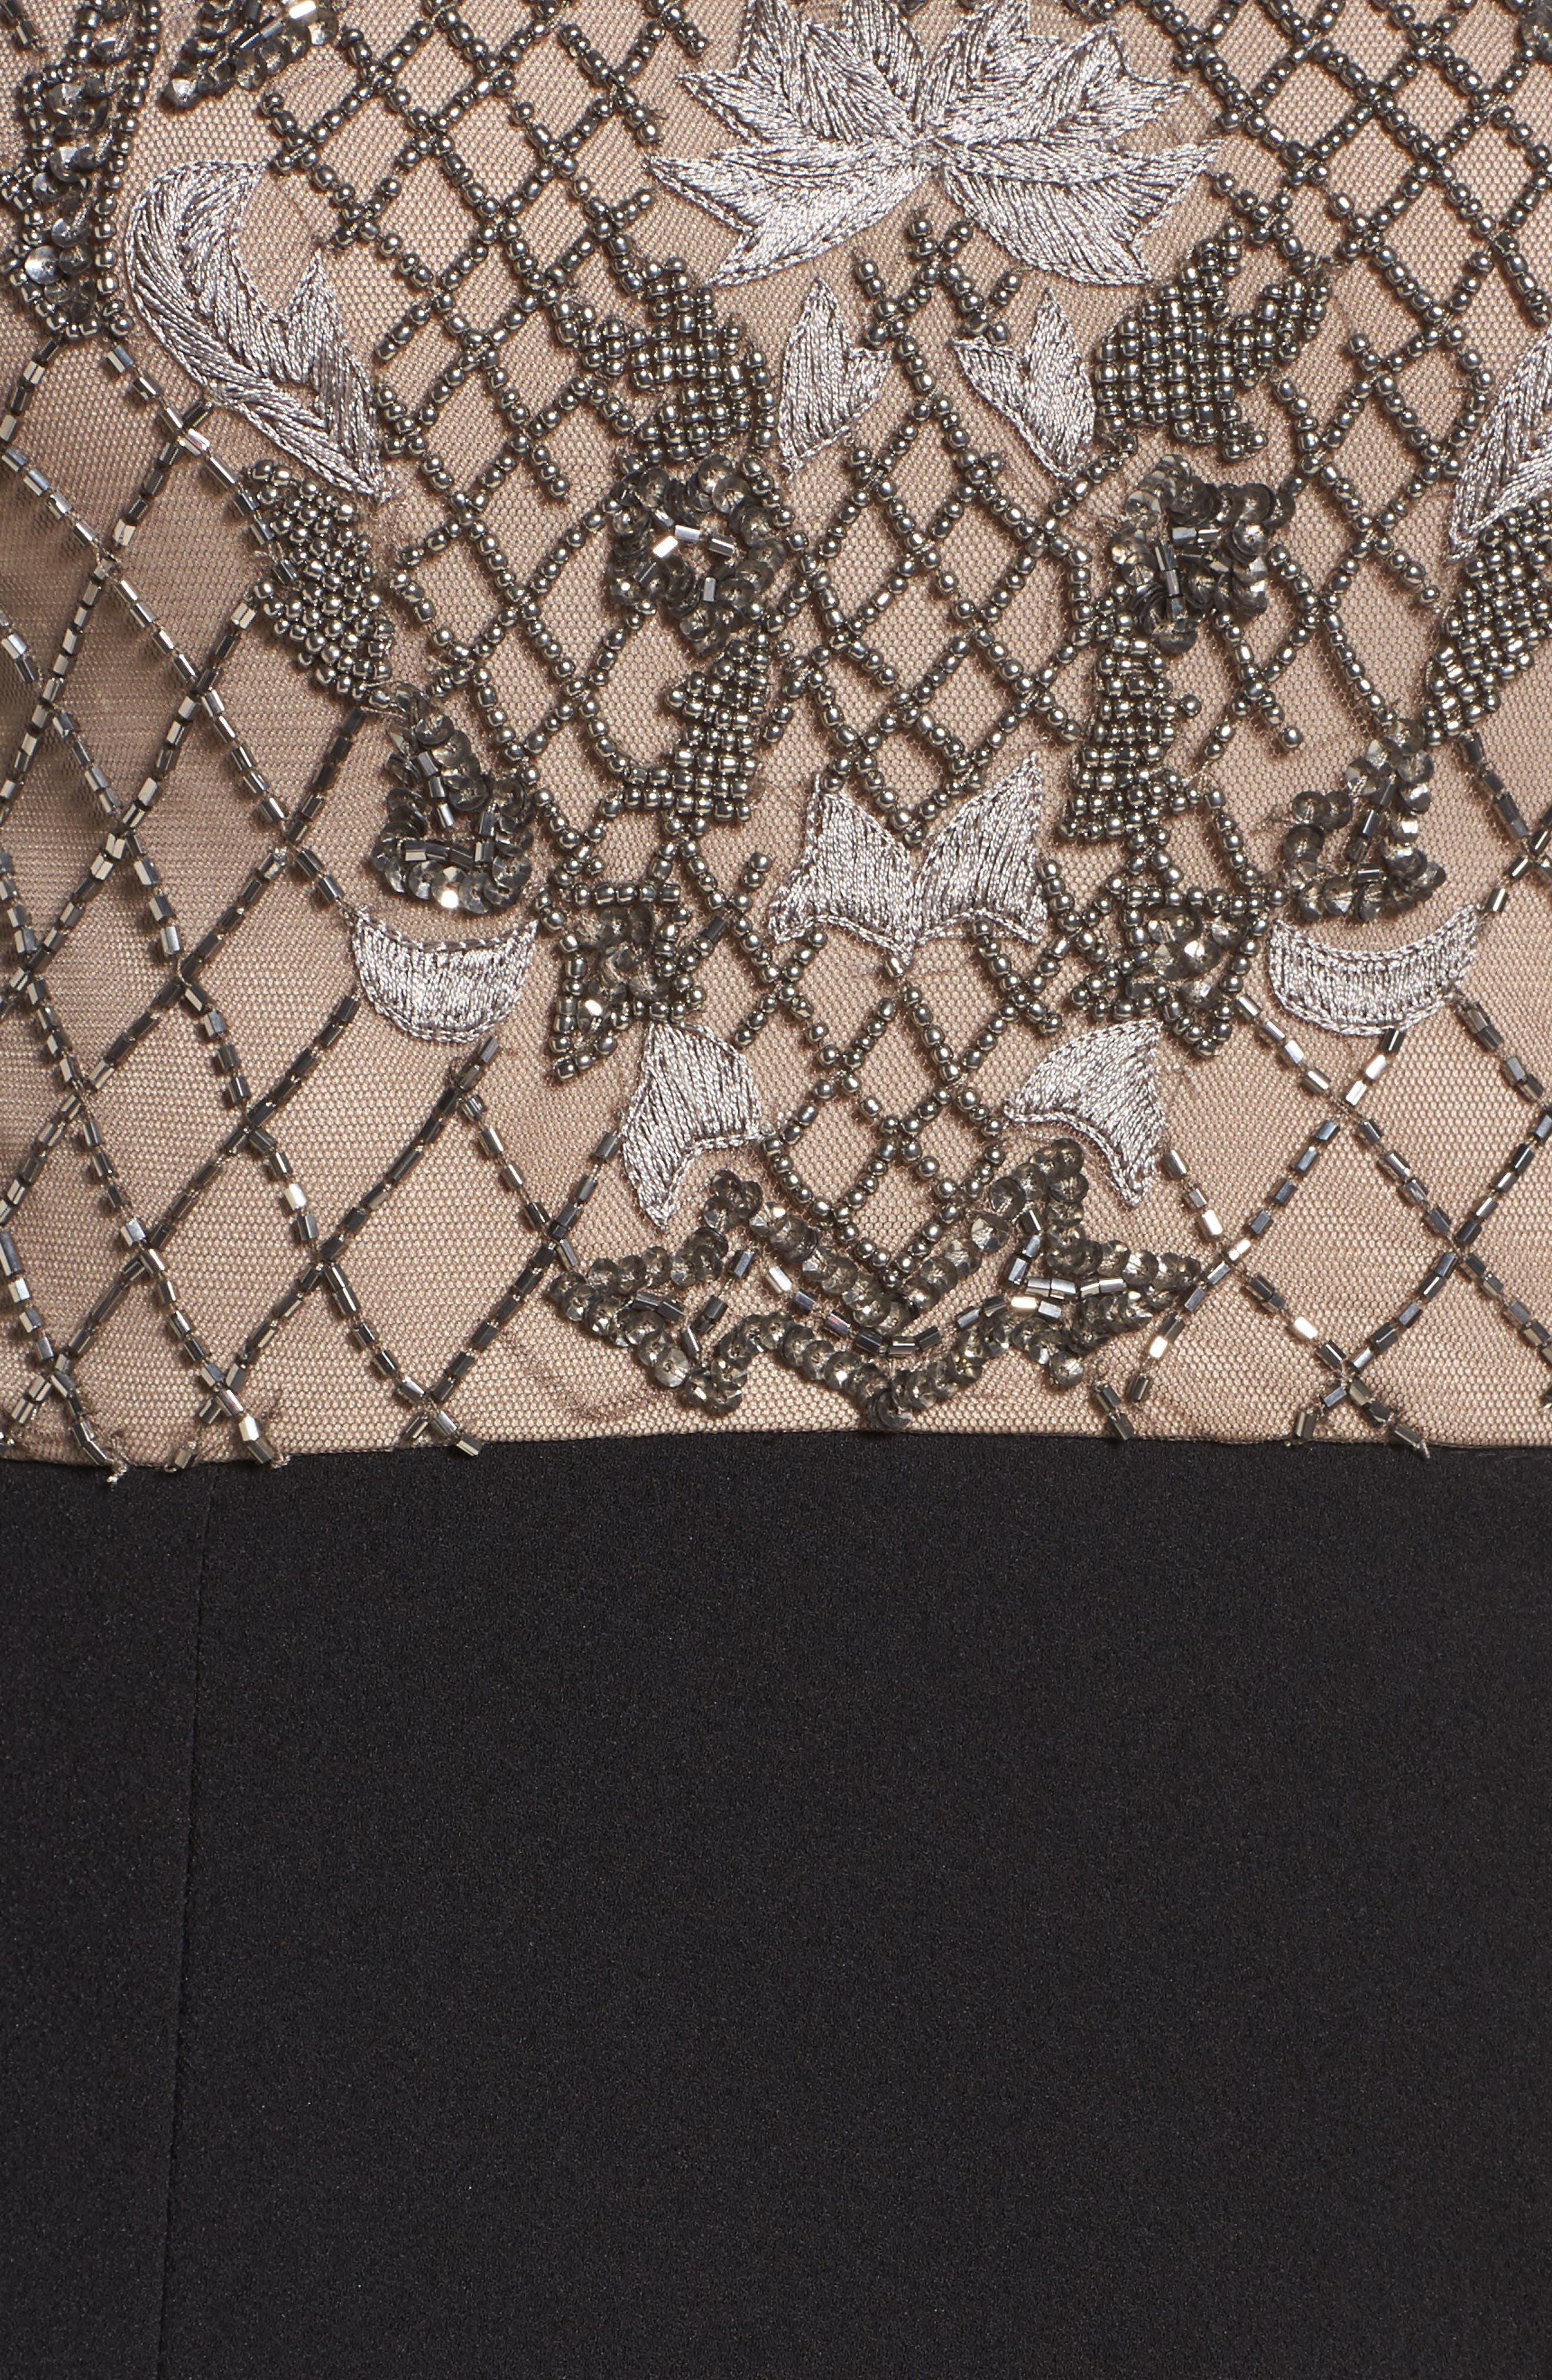 Embellished Bodice Drape Front Dress,                             Alternate thumbnail 5, color,                             002